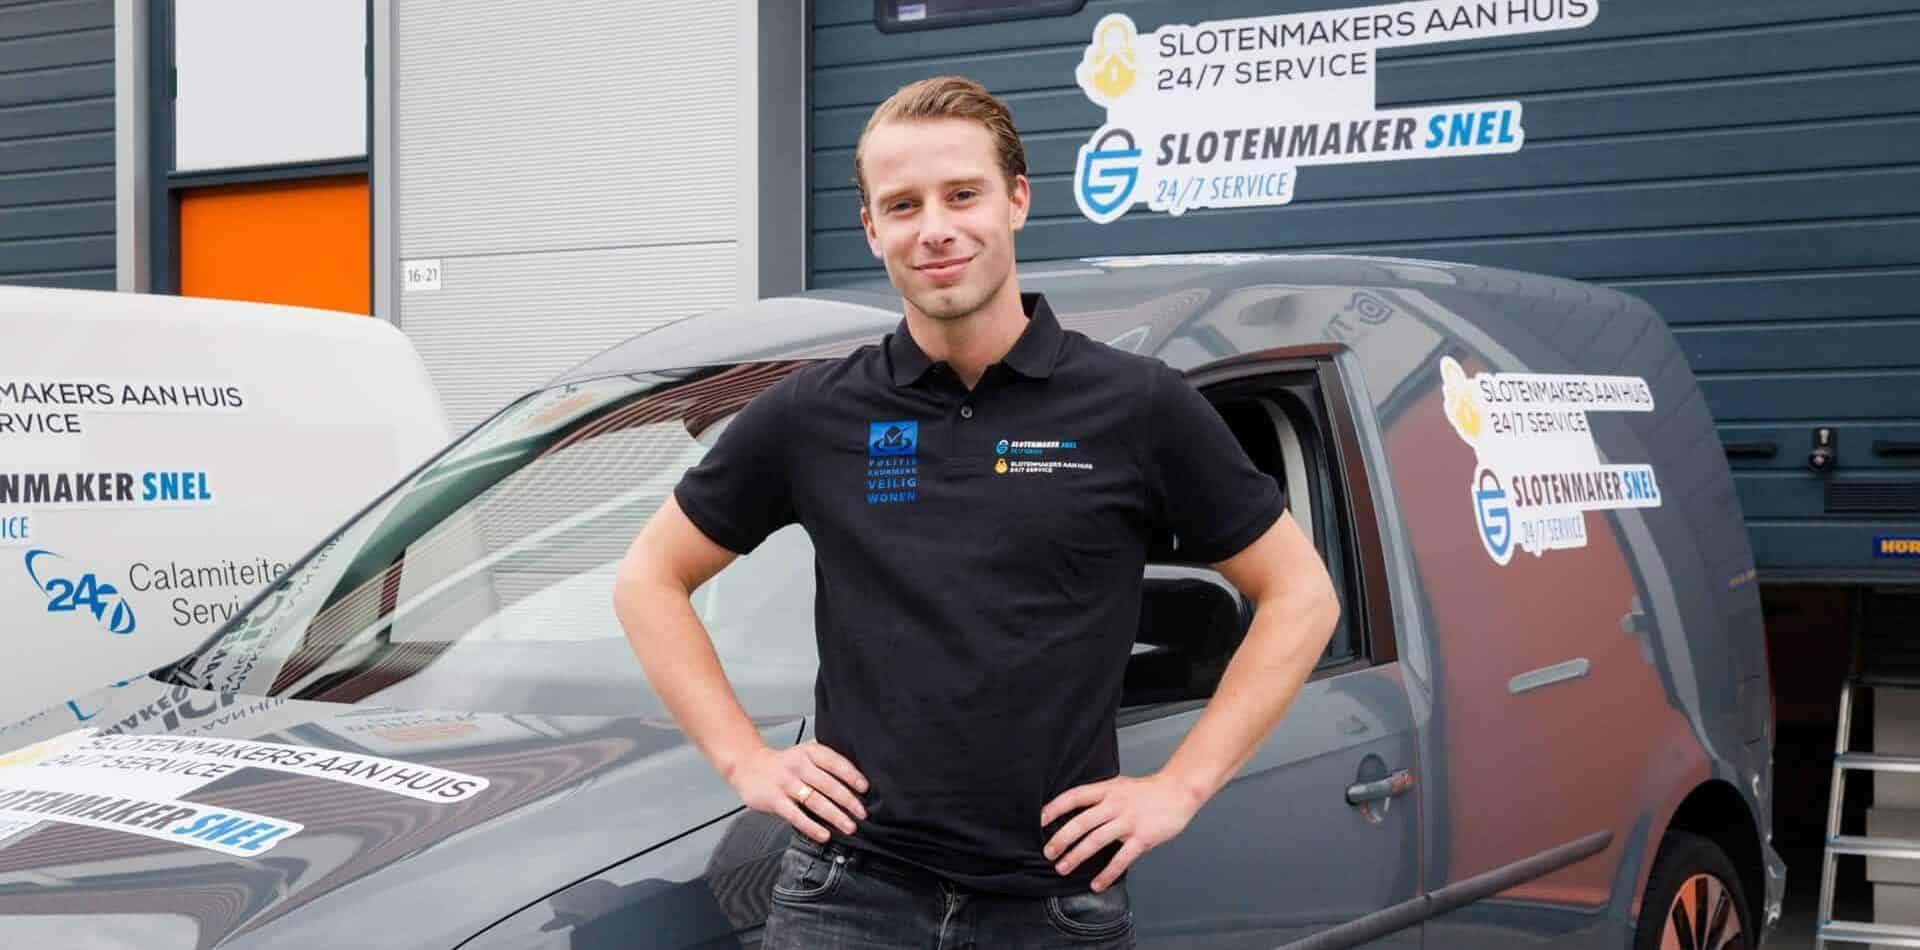 Slotenmaker Breda (6)